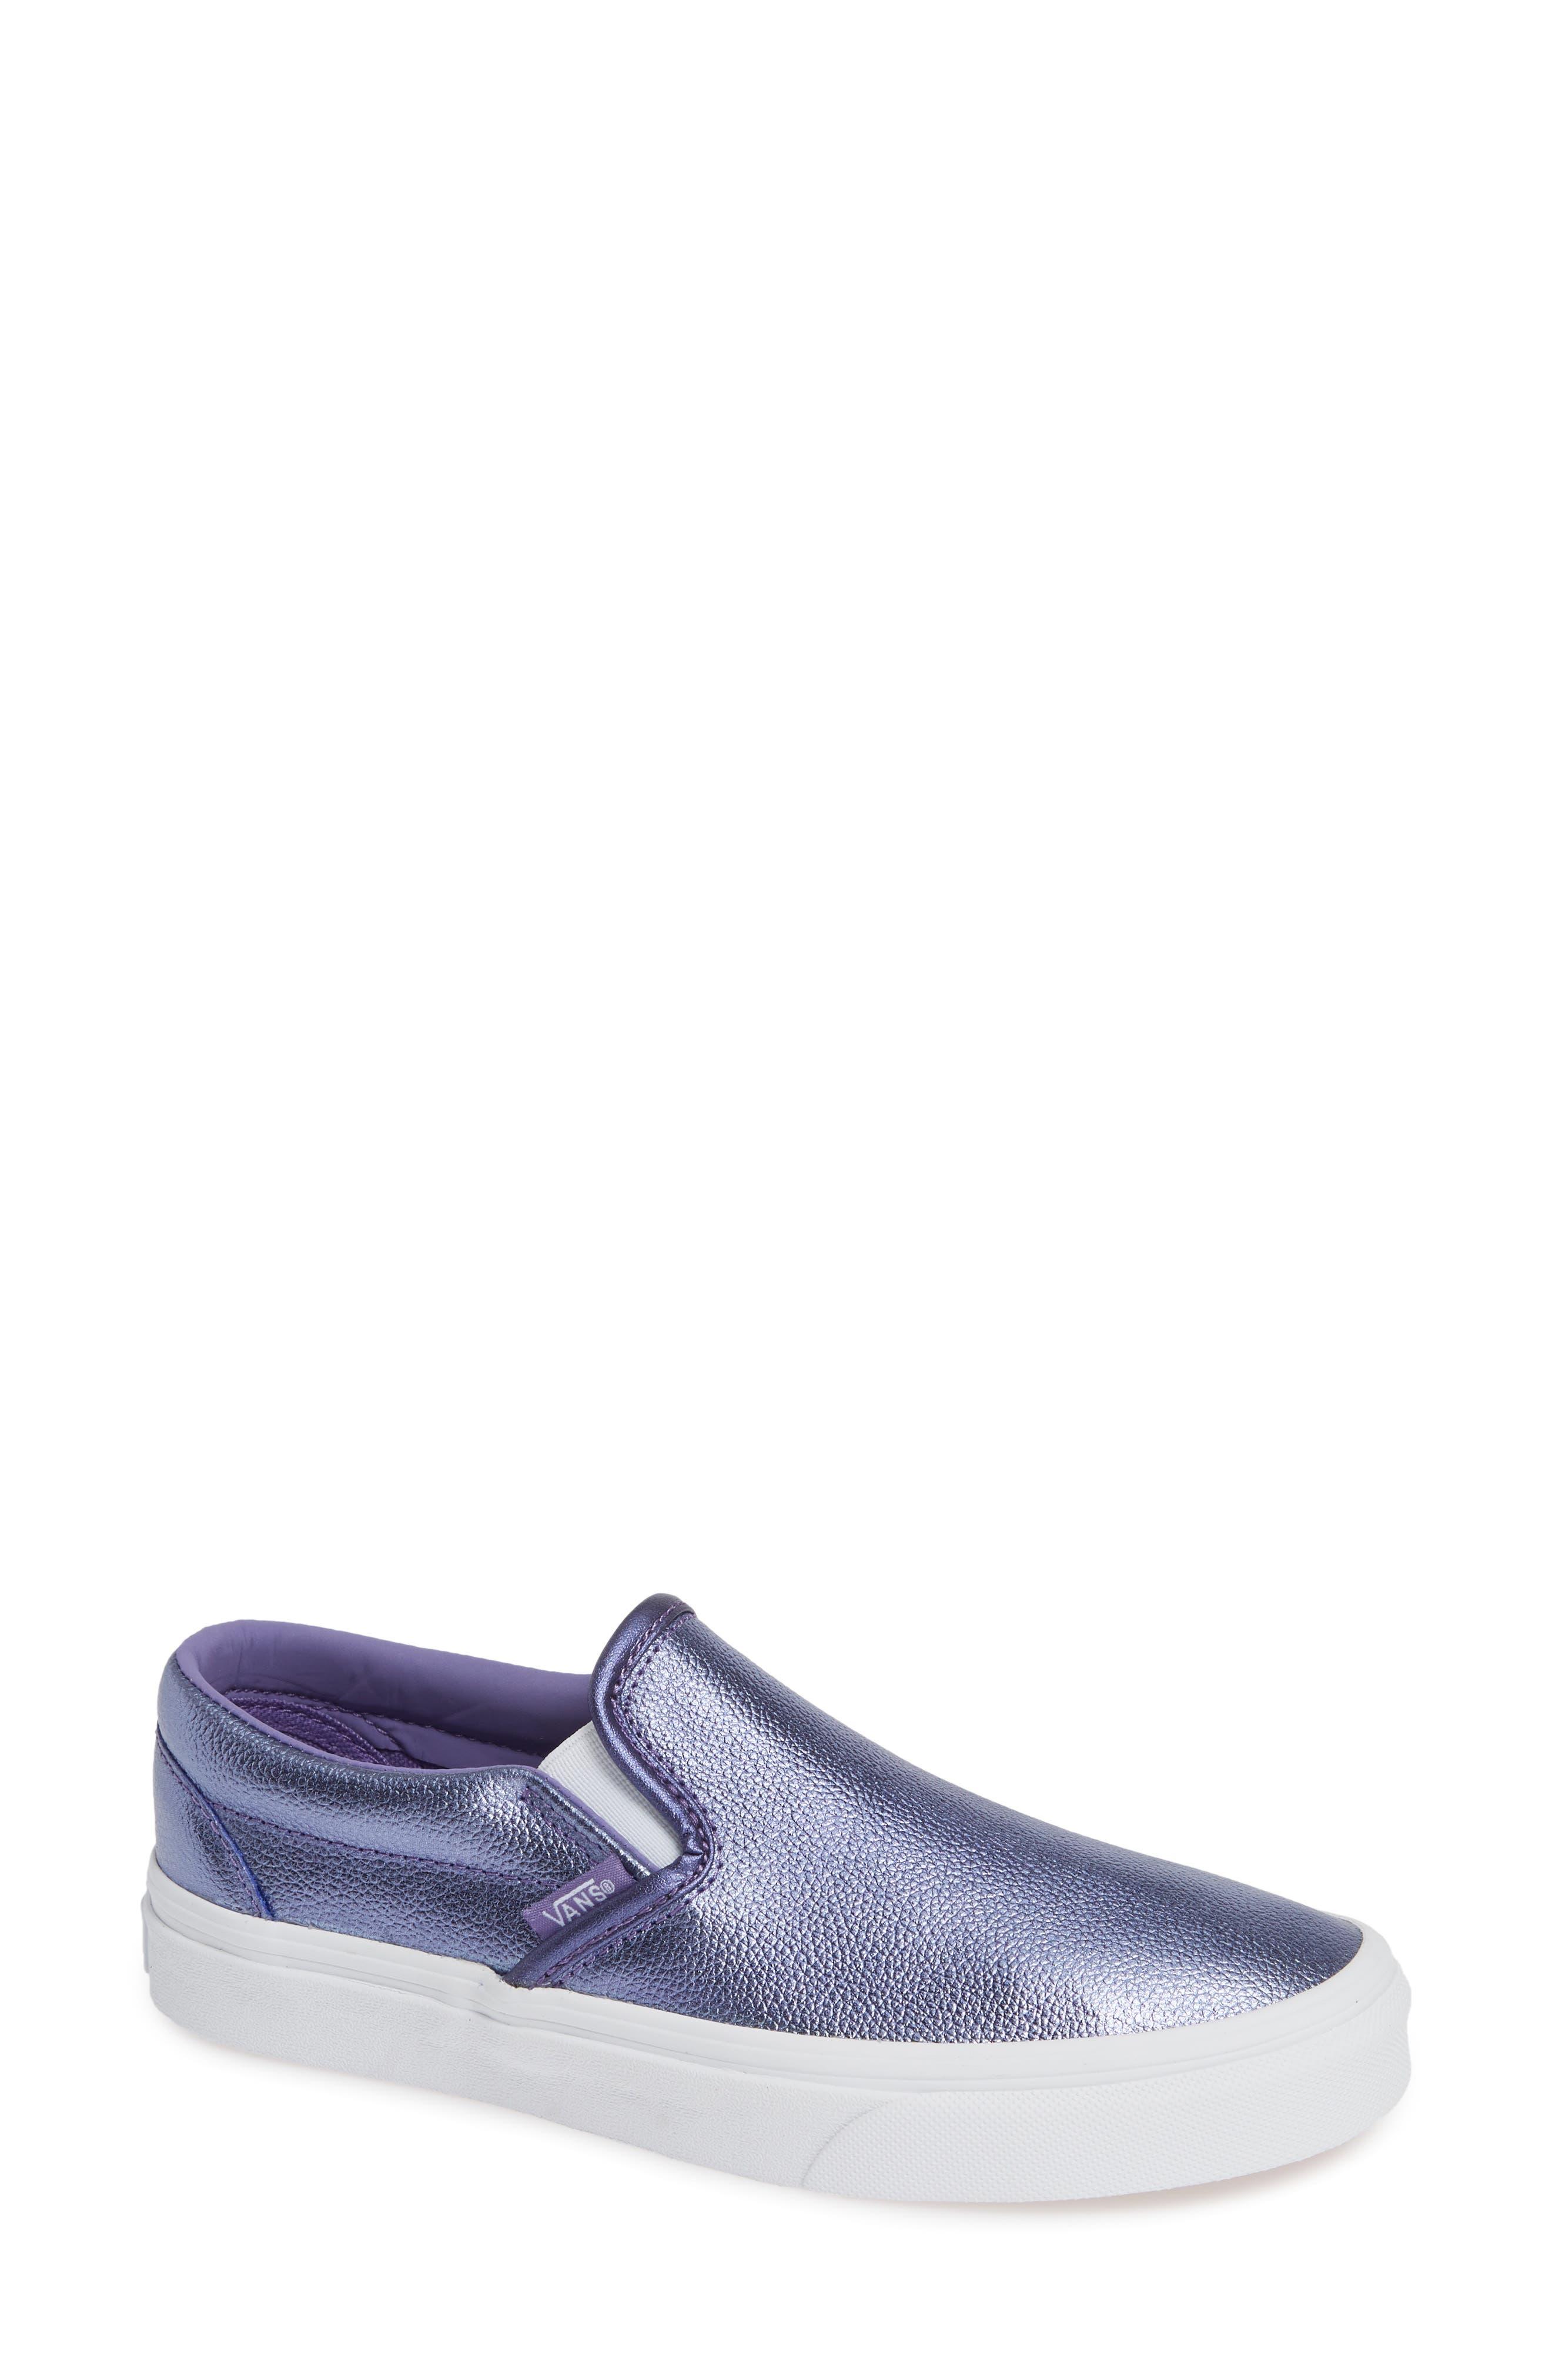 ,                             Classic Slip-On Sneaker,                             Main thumbnail 41, color,                             403